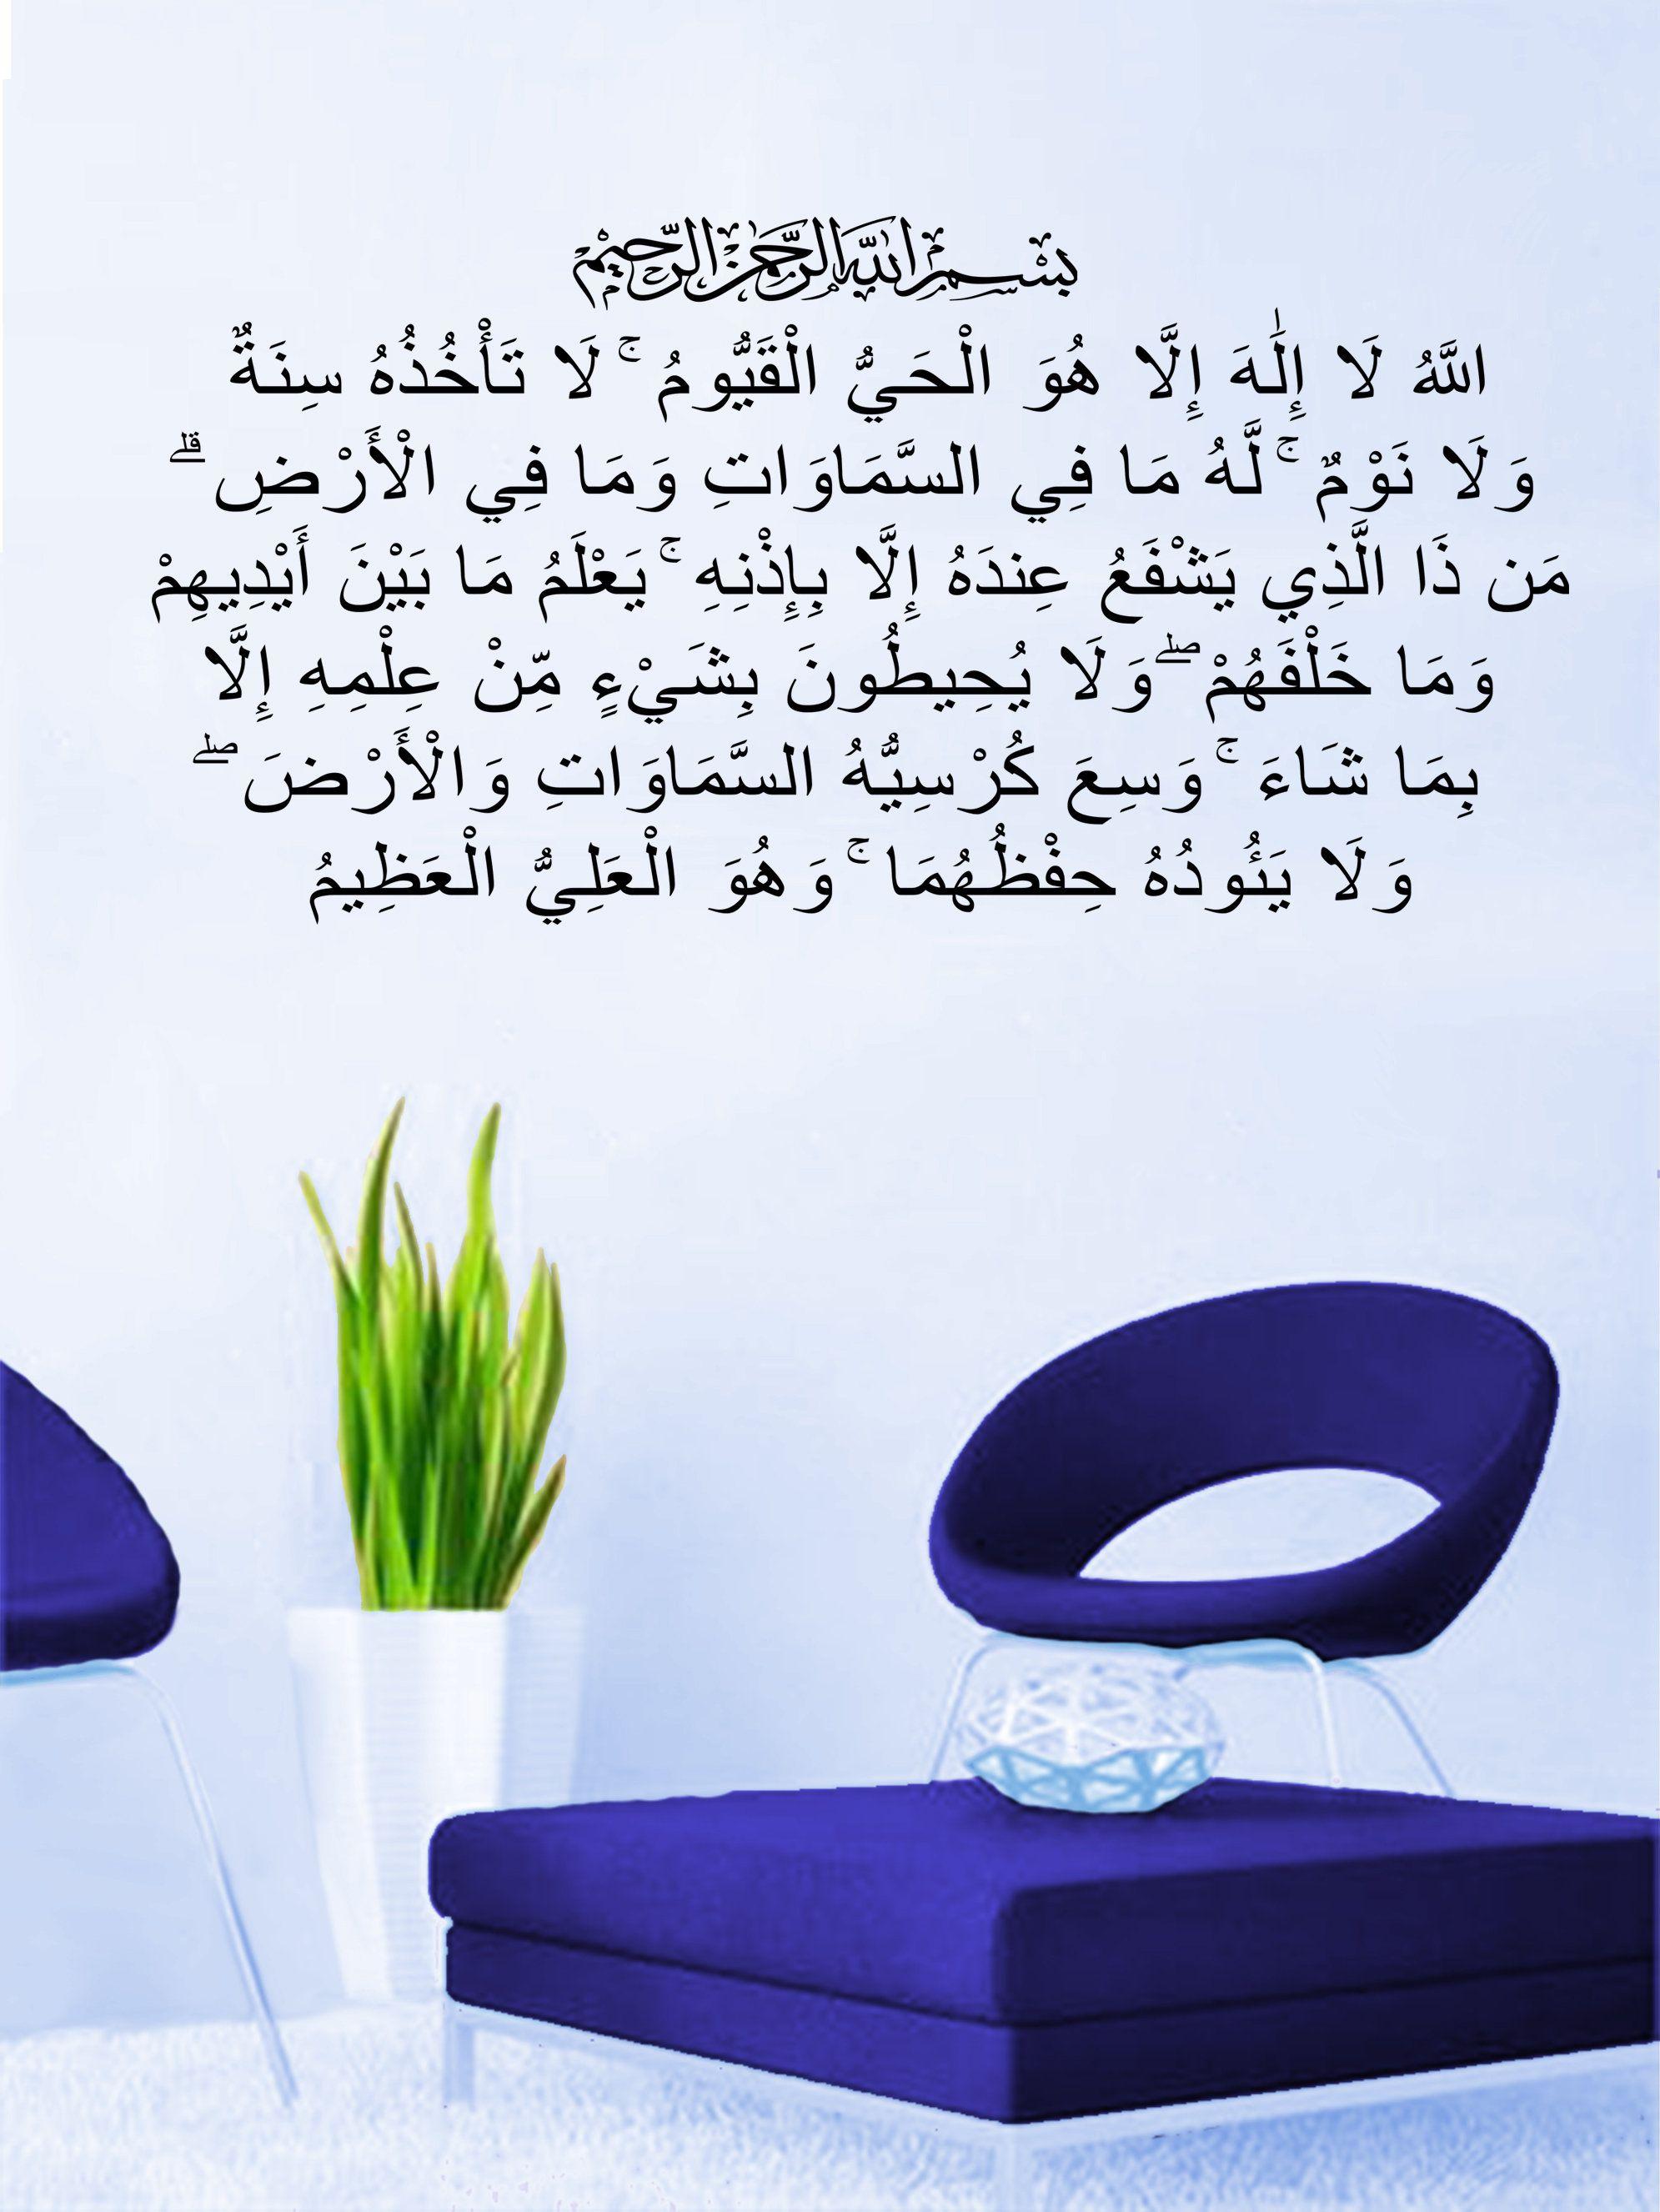 Islamic Ayatul Kursi Wall Sticker Home decor decals Eid and Hajj Gift,Ramadan